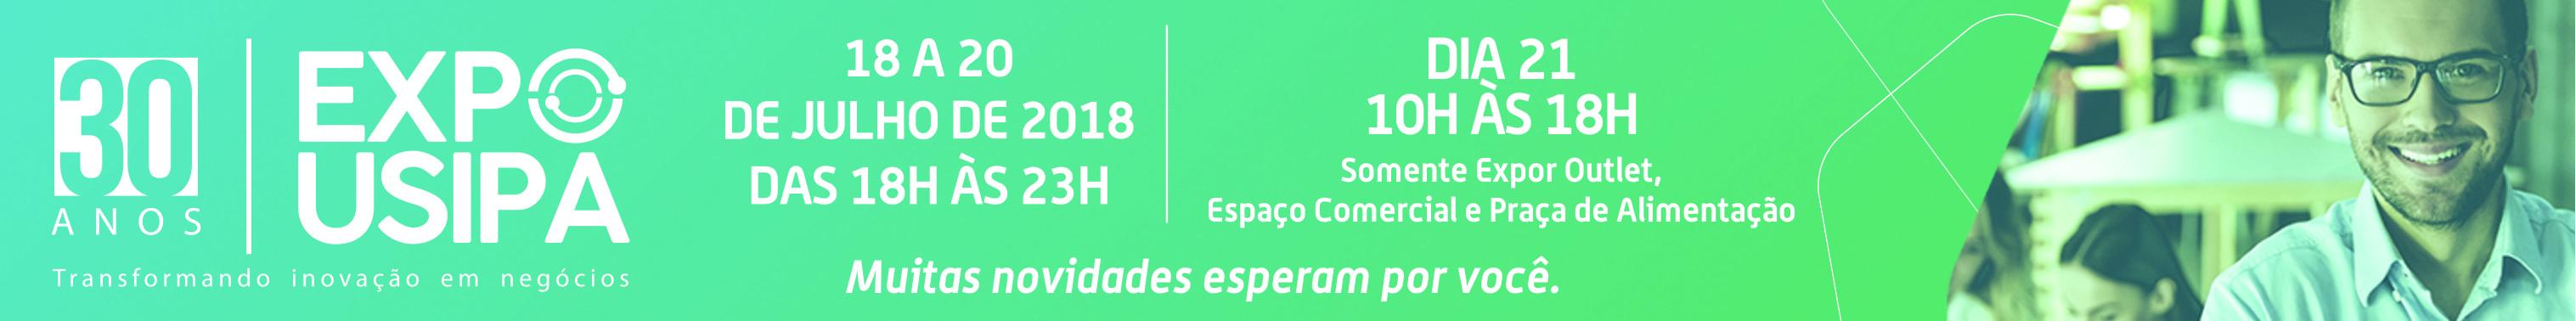 EXPO USIPA 30 ANOS (RUMO COM.)